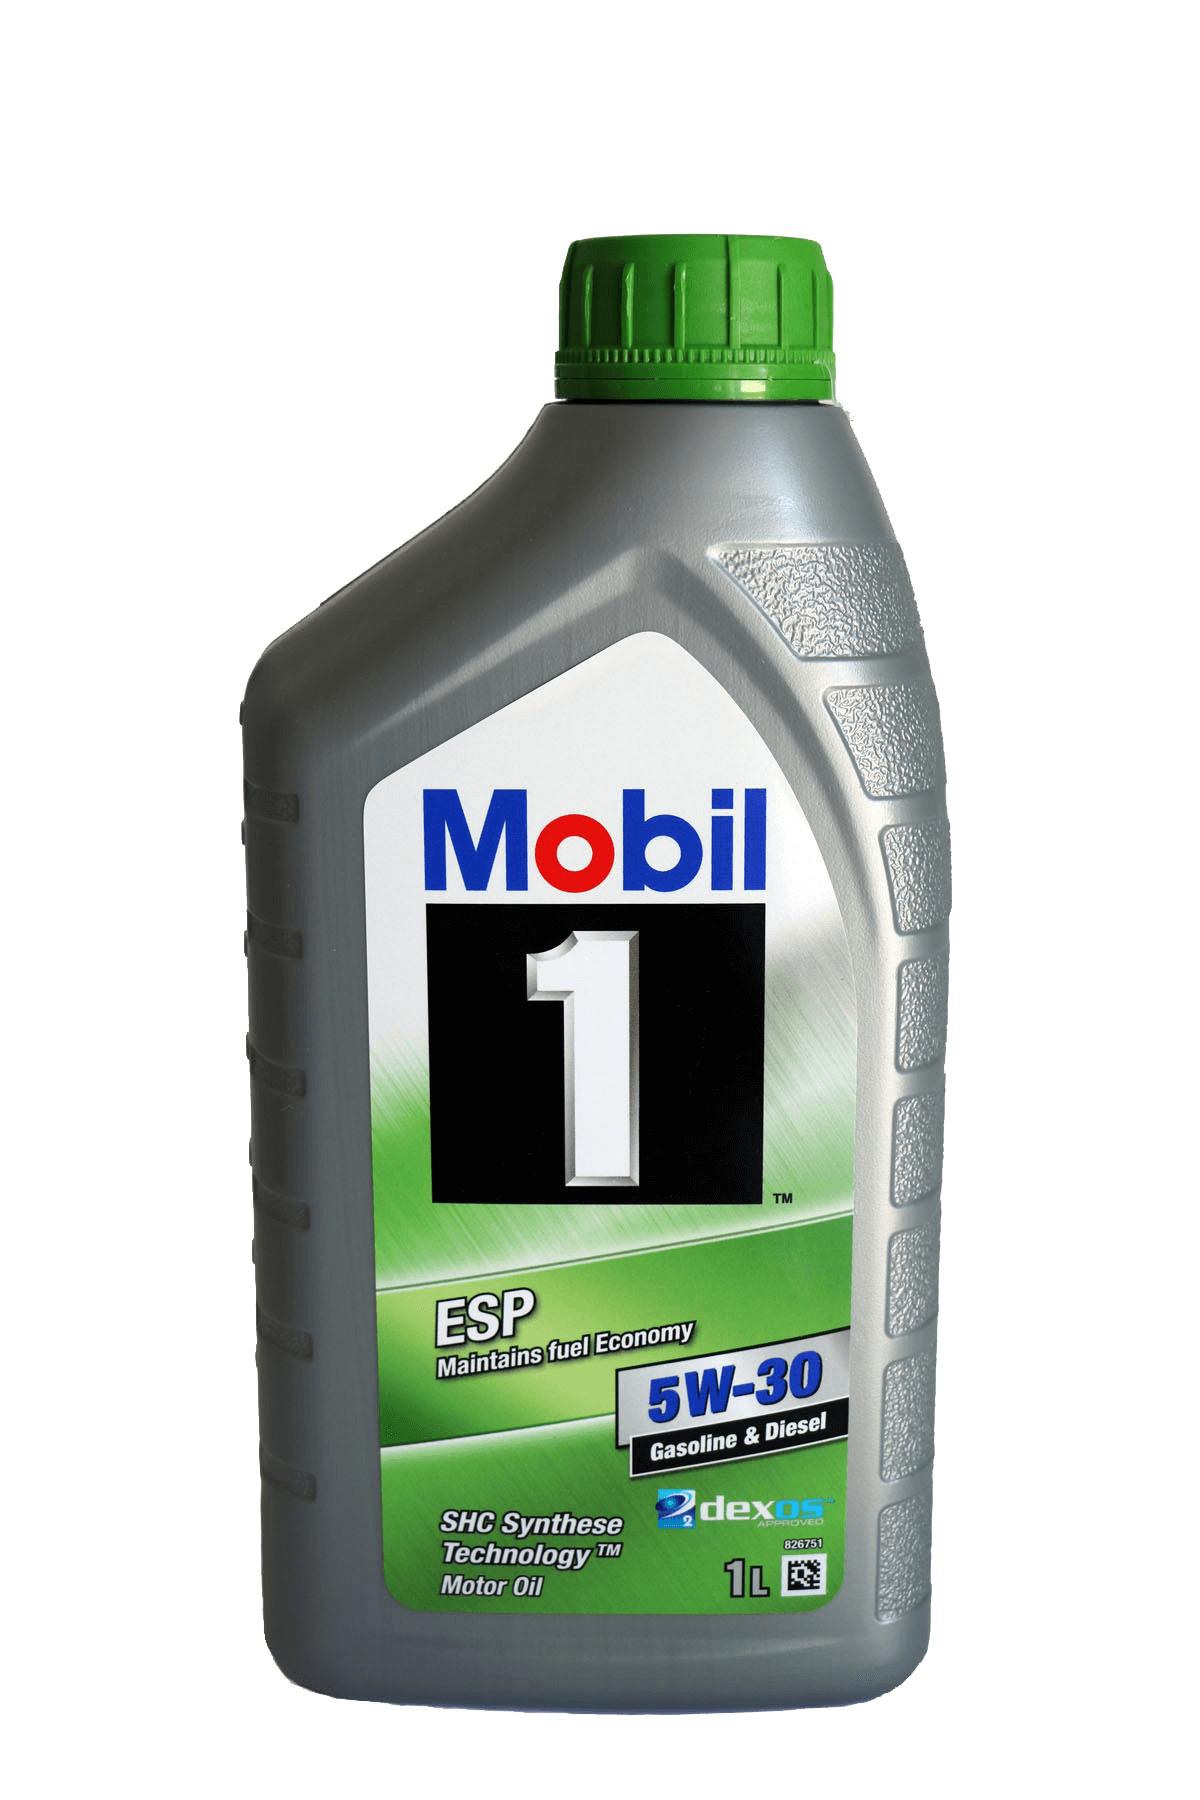 Mobil 1 ESP 5W-30 Motoröl, 1l